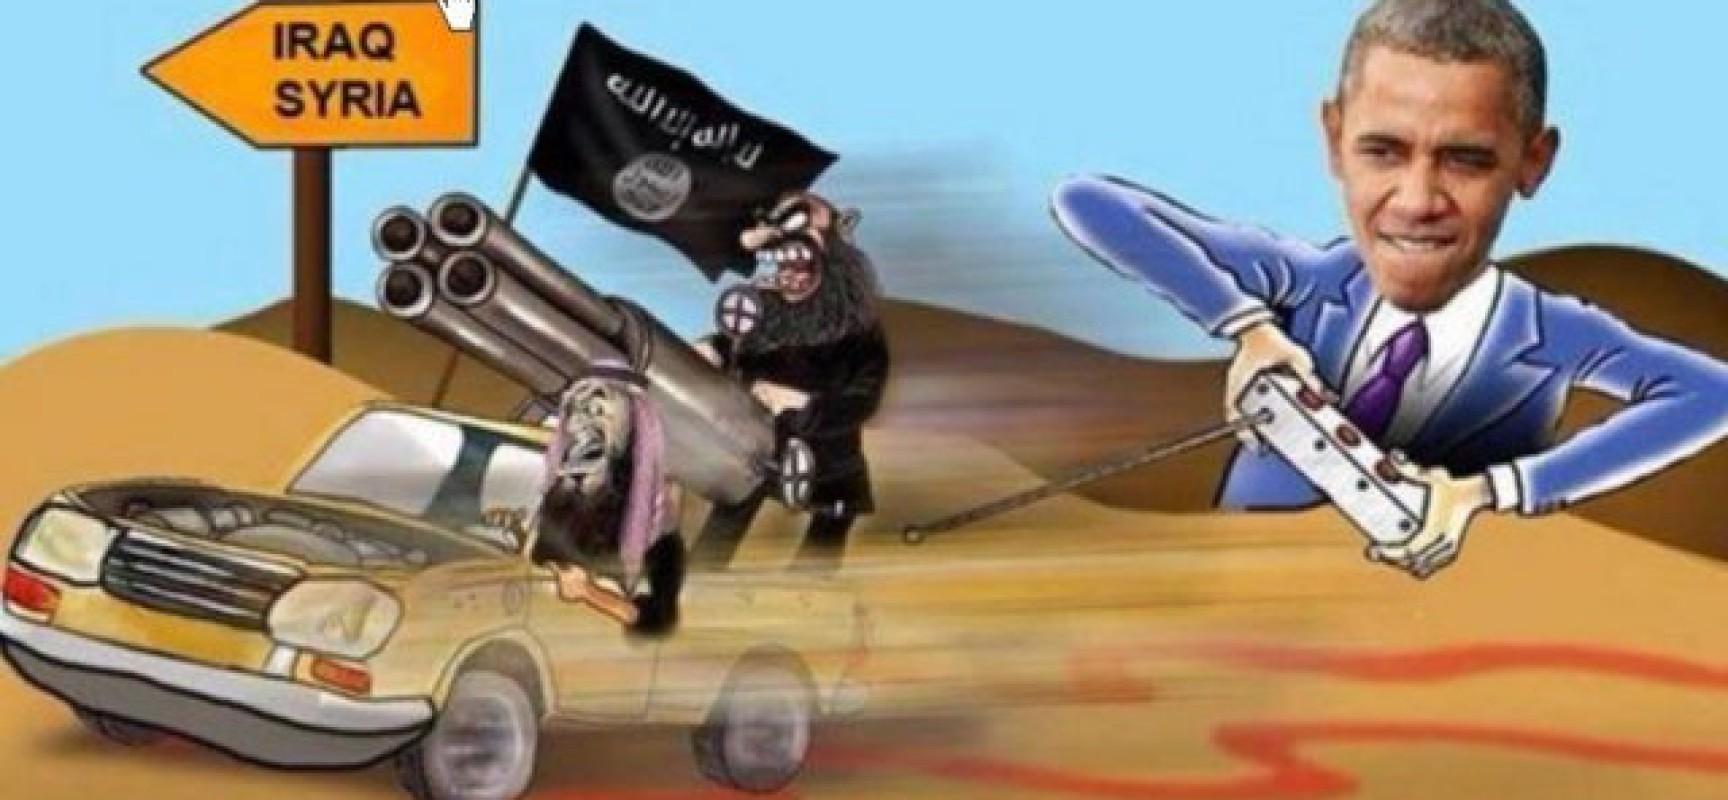 Le Hezbollah capture un officier de la CIA commandant Al Nosra à Alep